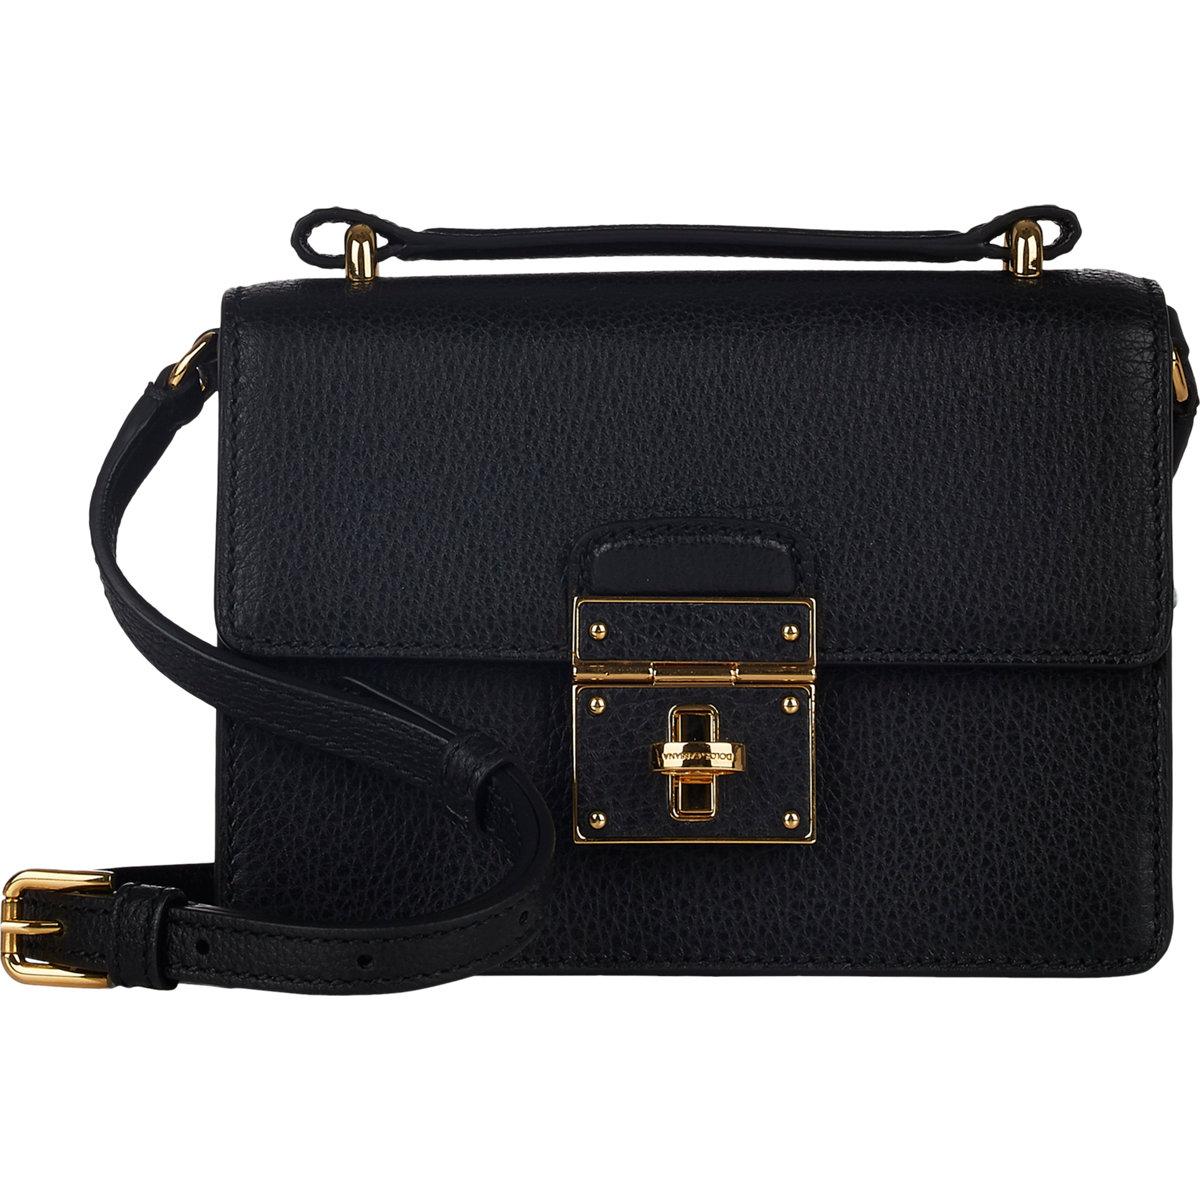 93453cb5c3f9 Lyst - Dolce   Gabbana Rosalia Mini Trunk Crossbody Bag in Black